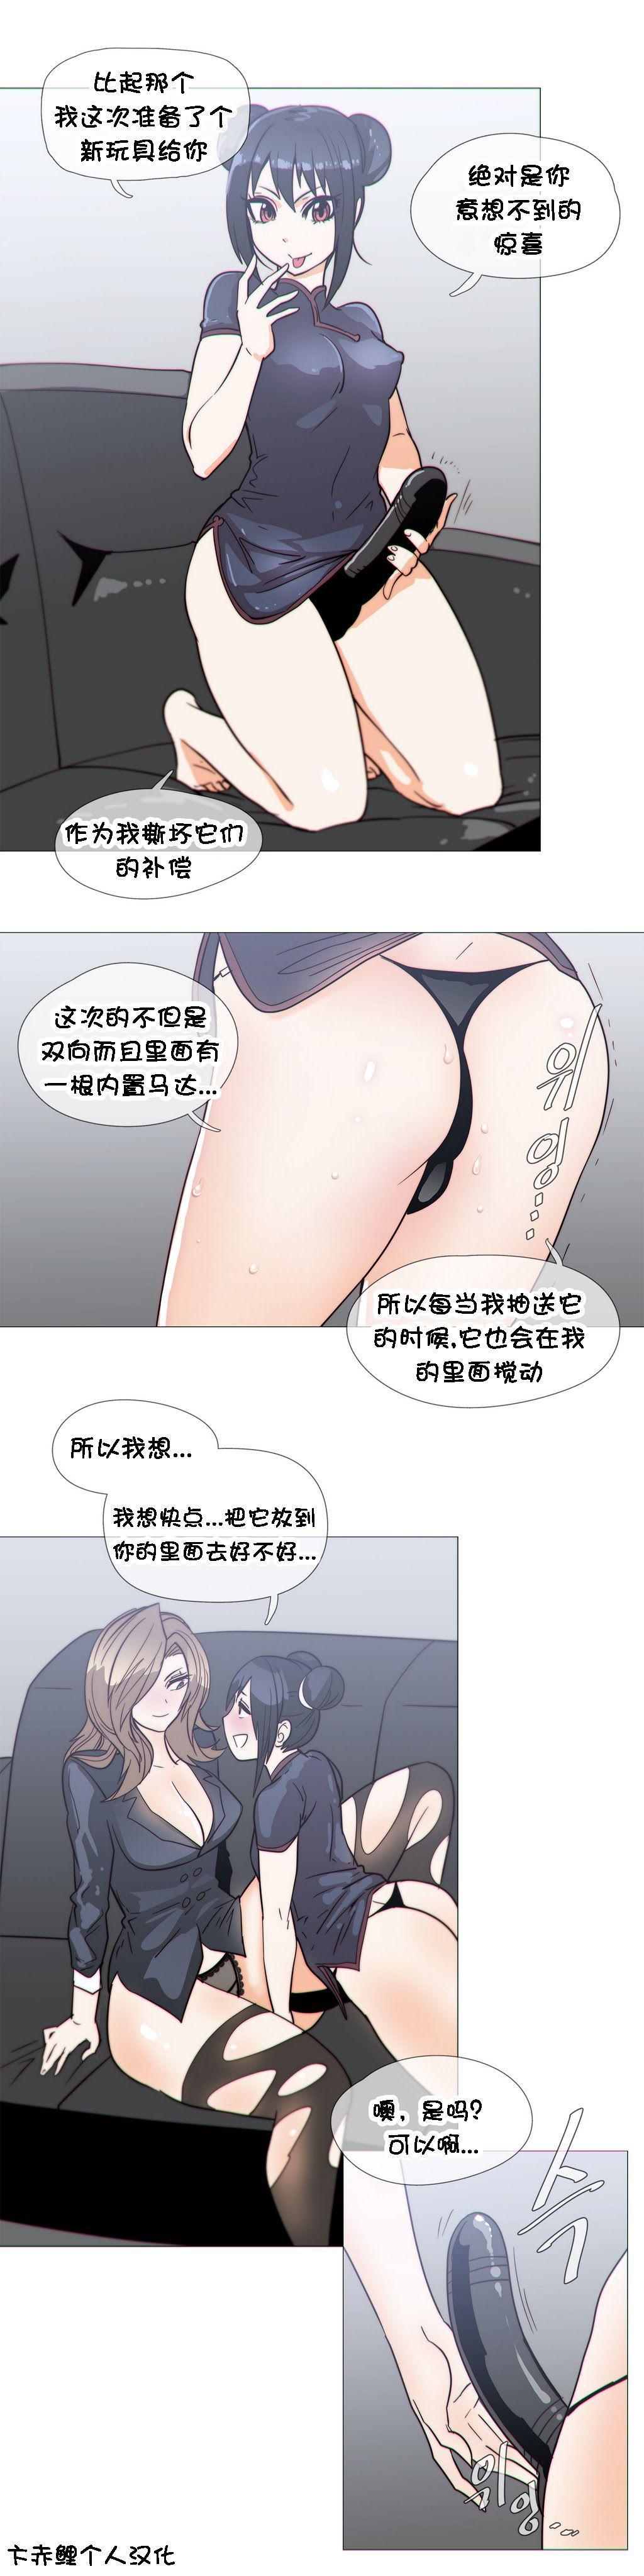 HouseHold Affairs 【卞赤鲤个人汉化】1~33话(持续更新中) 579